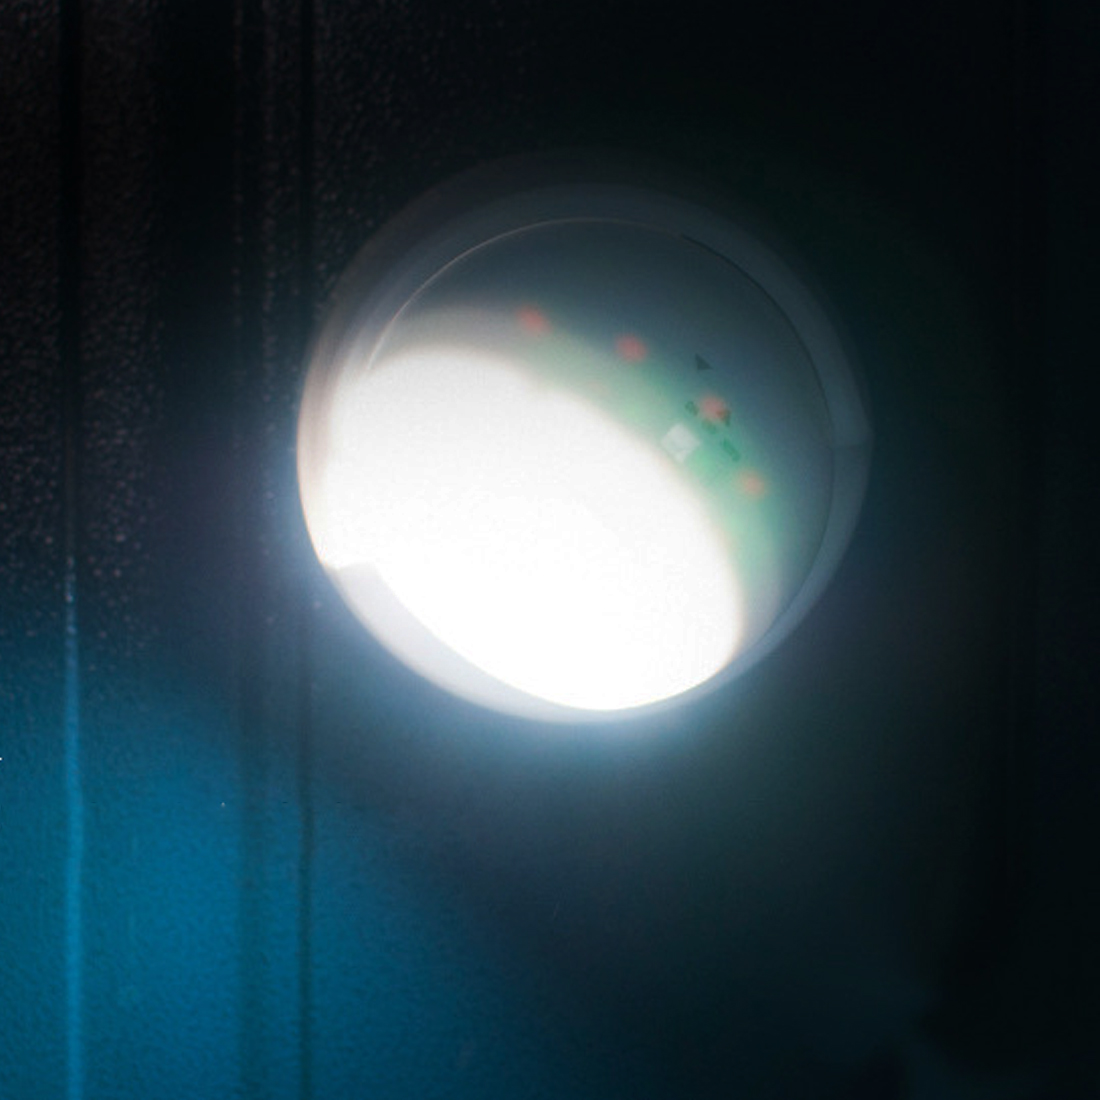 9 LED Motion Sensor Night Light 360 Degree Rotation Portable Night Light Auto IR Infrared Luminary Lamp Children Lamp LED sn101 mini 360 degree rotation 0 1w yellow light auto sensor night lamp white 2 round pin plug